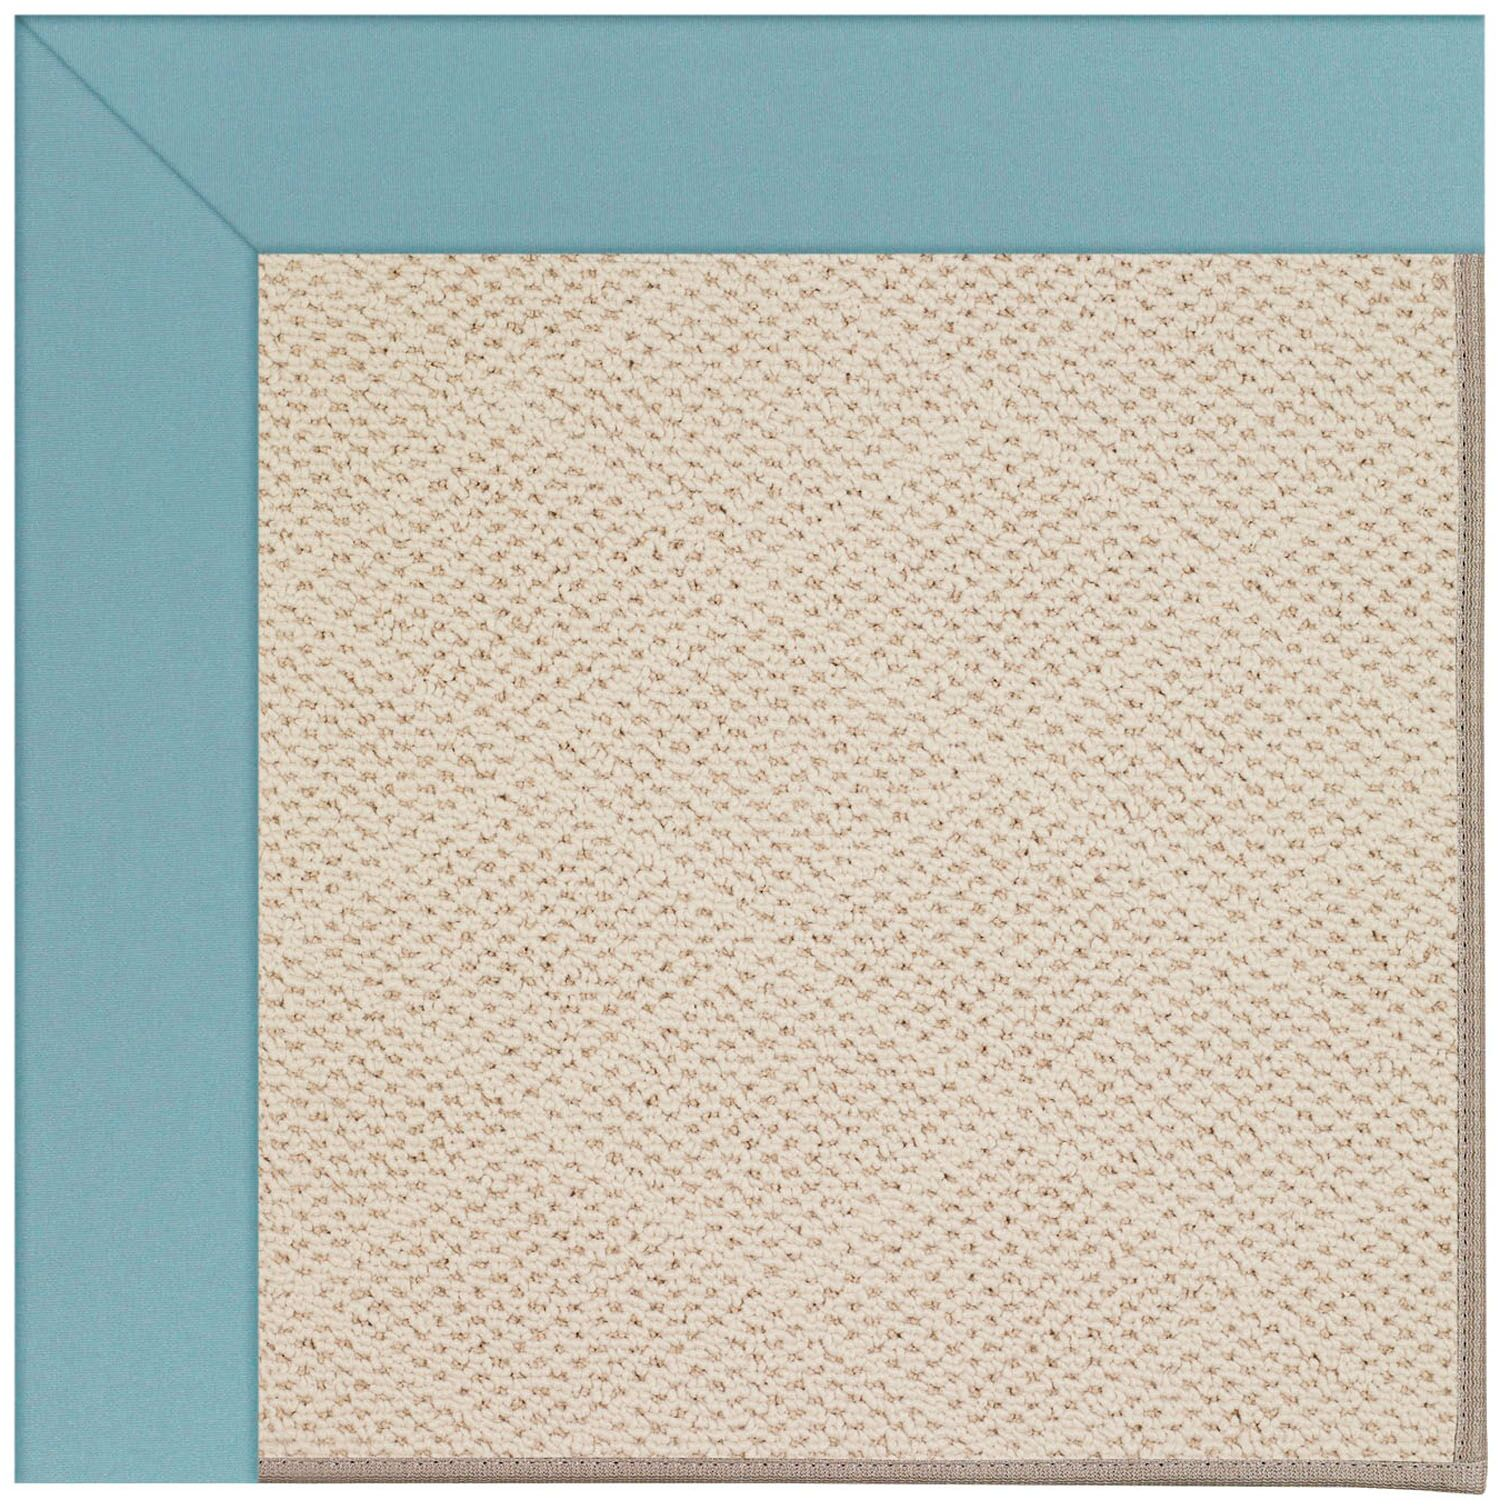 Lisle Sea Blue Indoor/Outdoor Area Rug Rug Size: Rectangle 2' x 3'